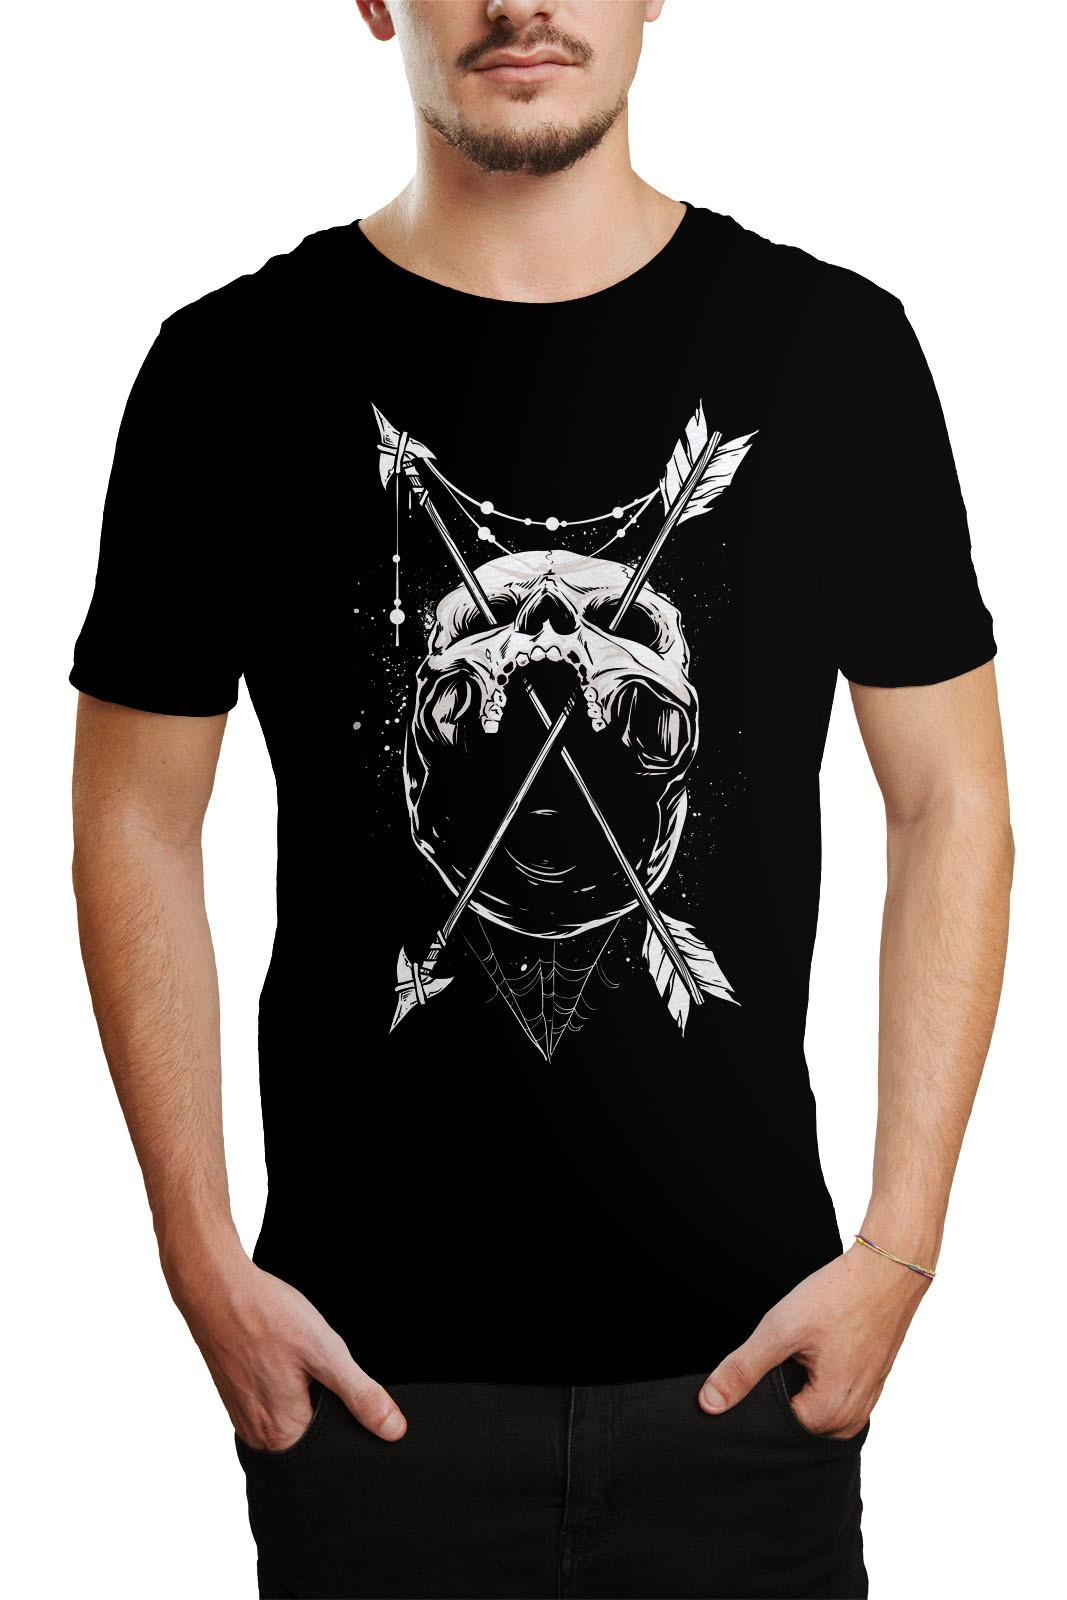 Camiseta HShop Flecha Preto  - HShop